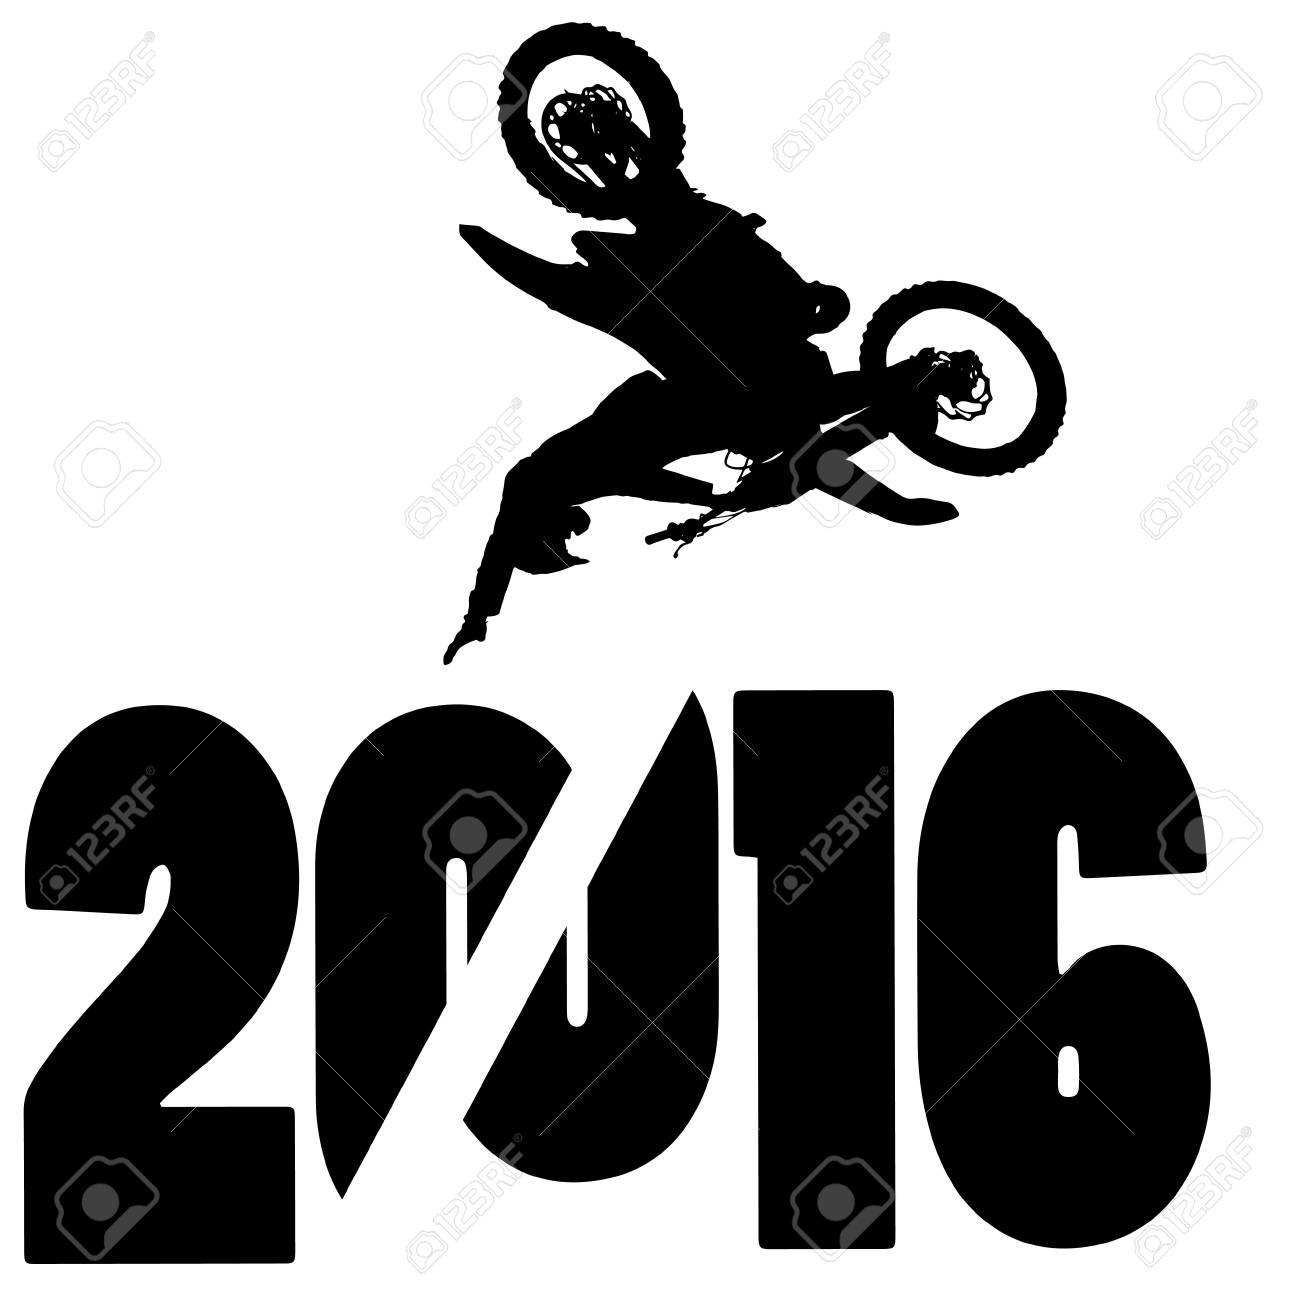 black silhouette vector illustration 2016 New Year - 46204129